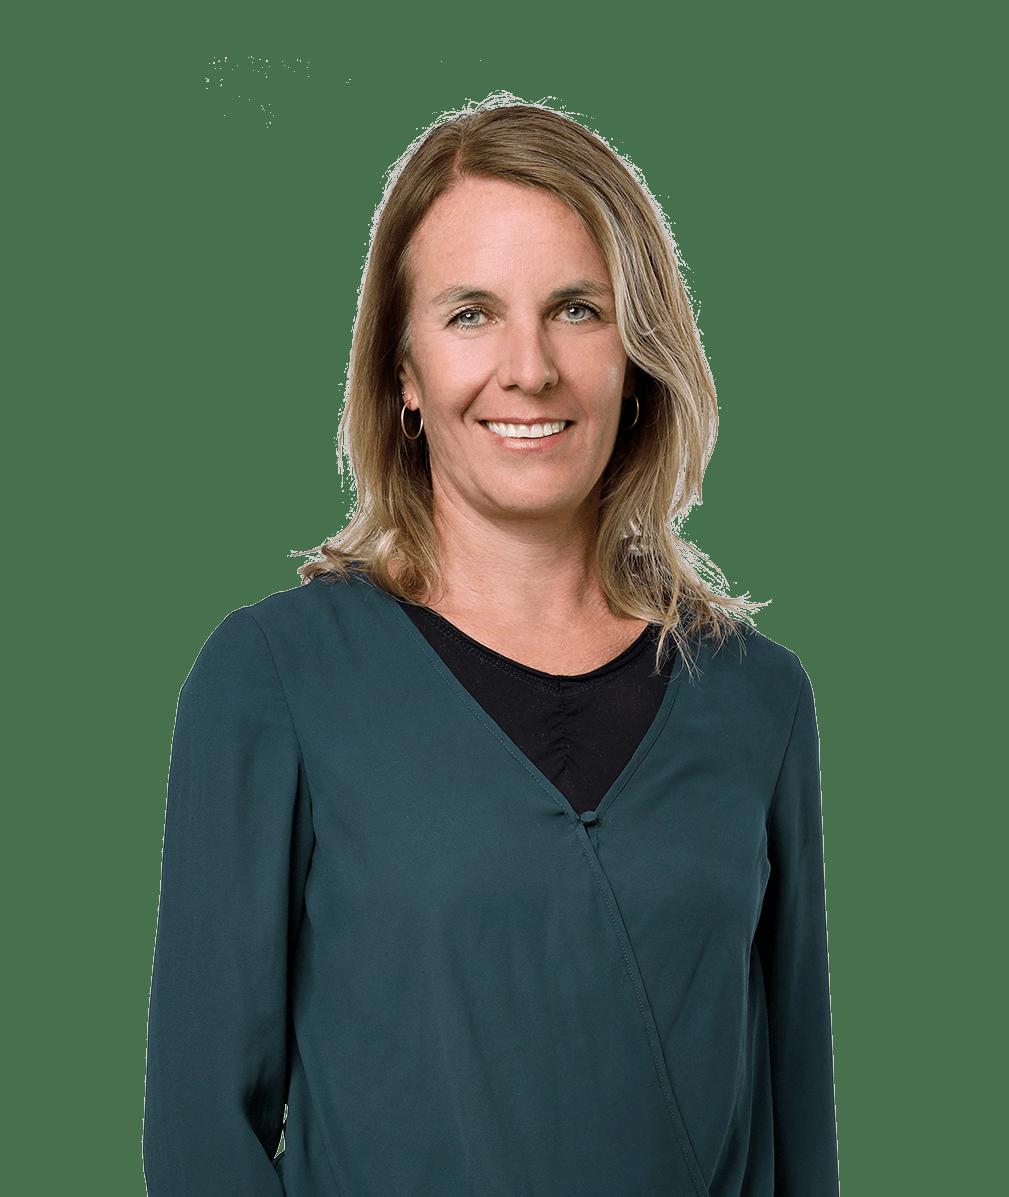 Portrait Kandidat